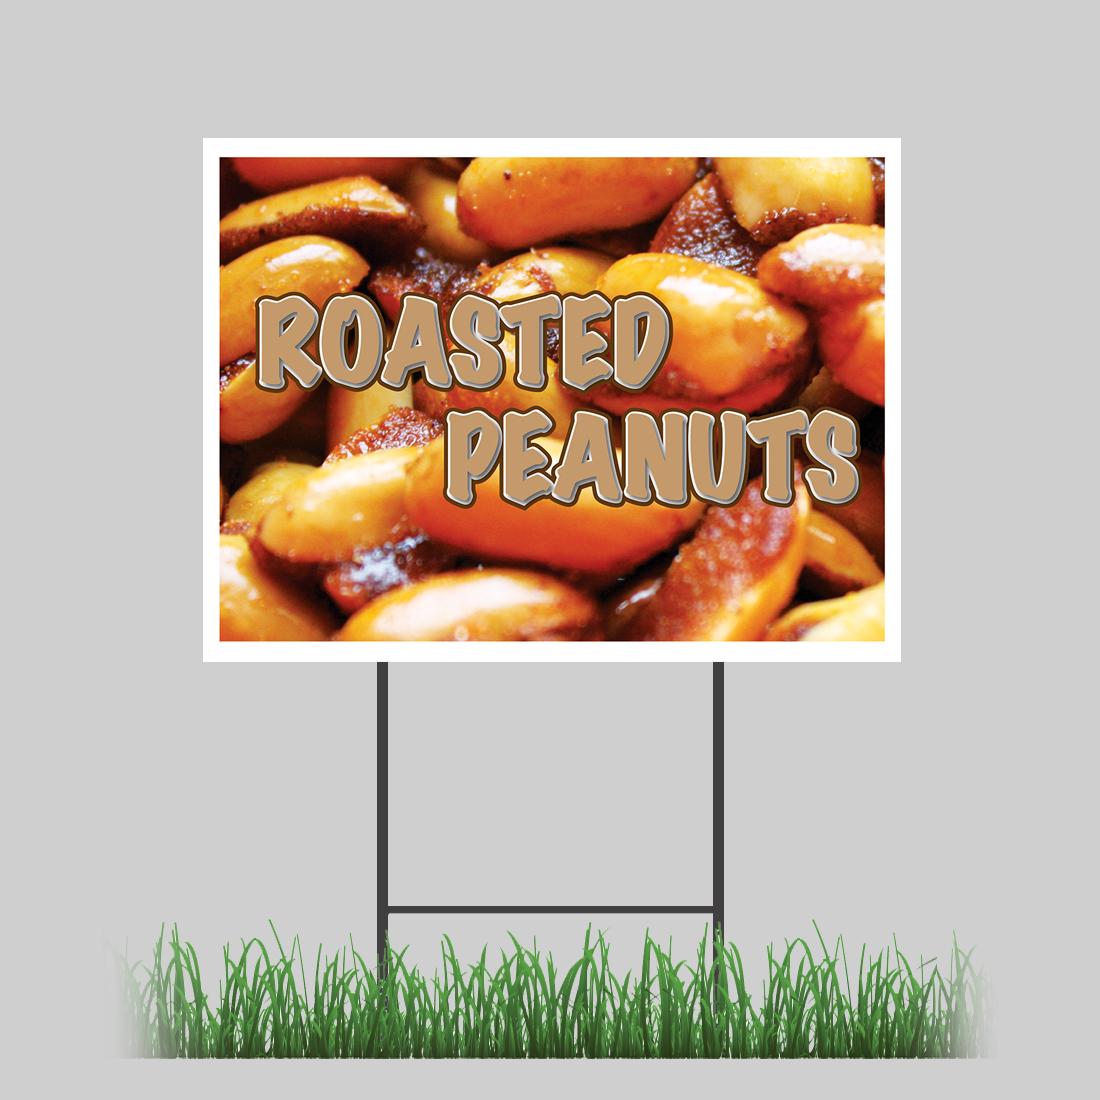 18x24 Pork Rinds Yard Sign Hot Fresh Crispy Skin Fried Salty Concession Stand